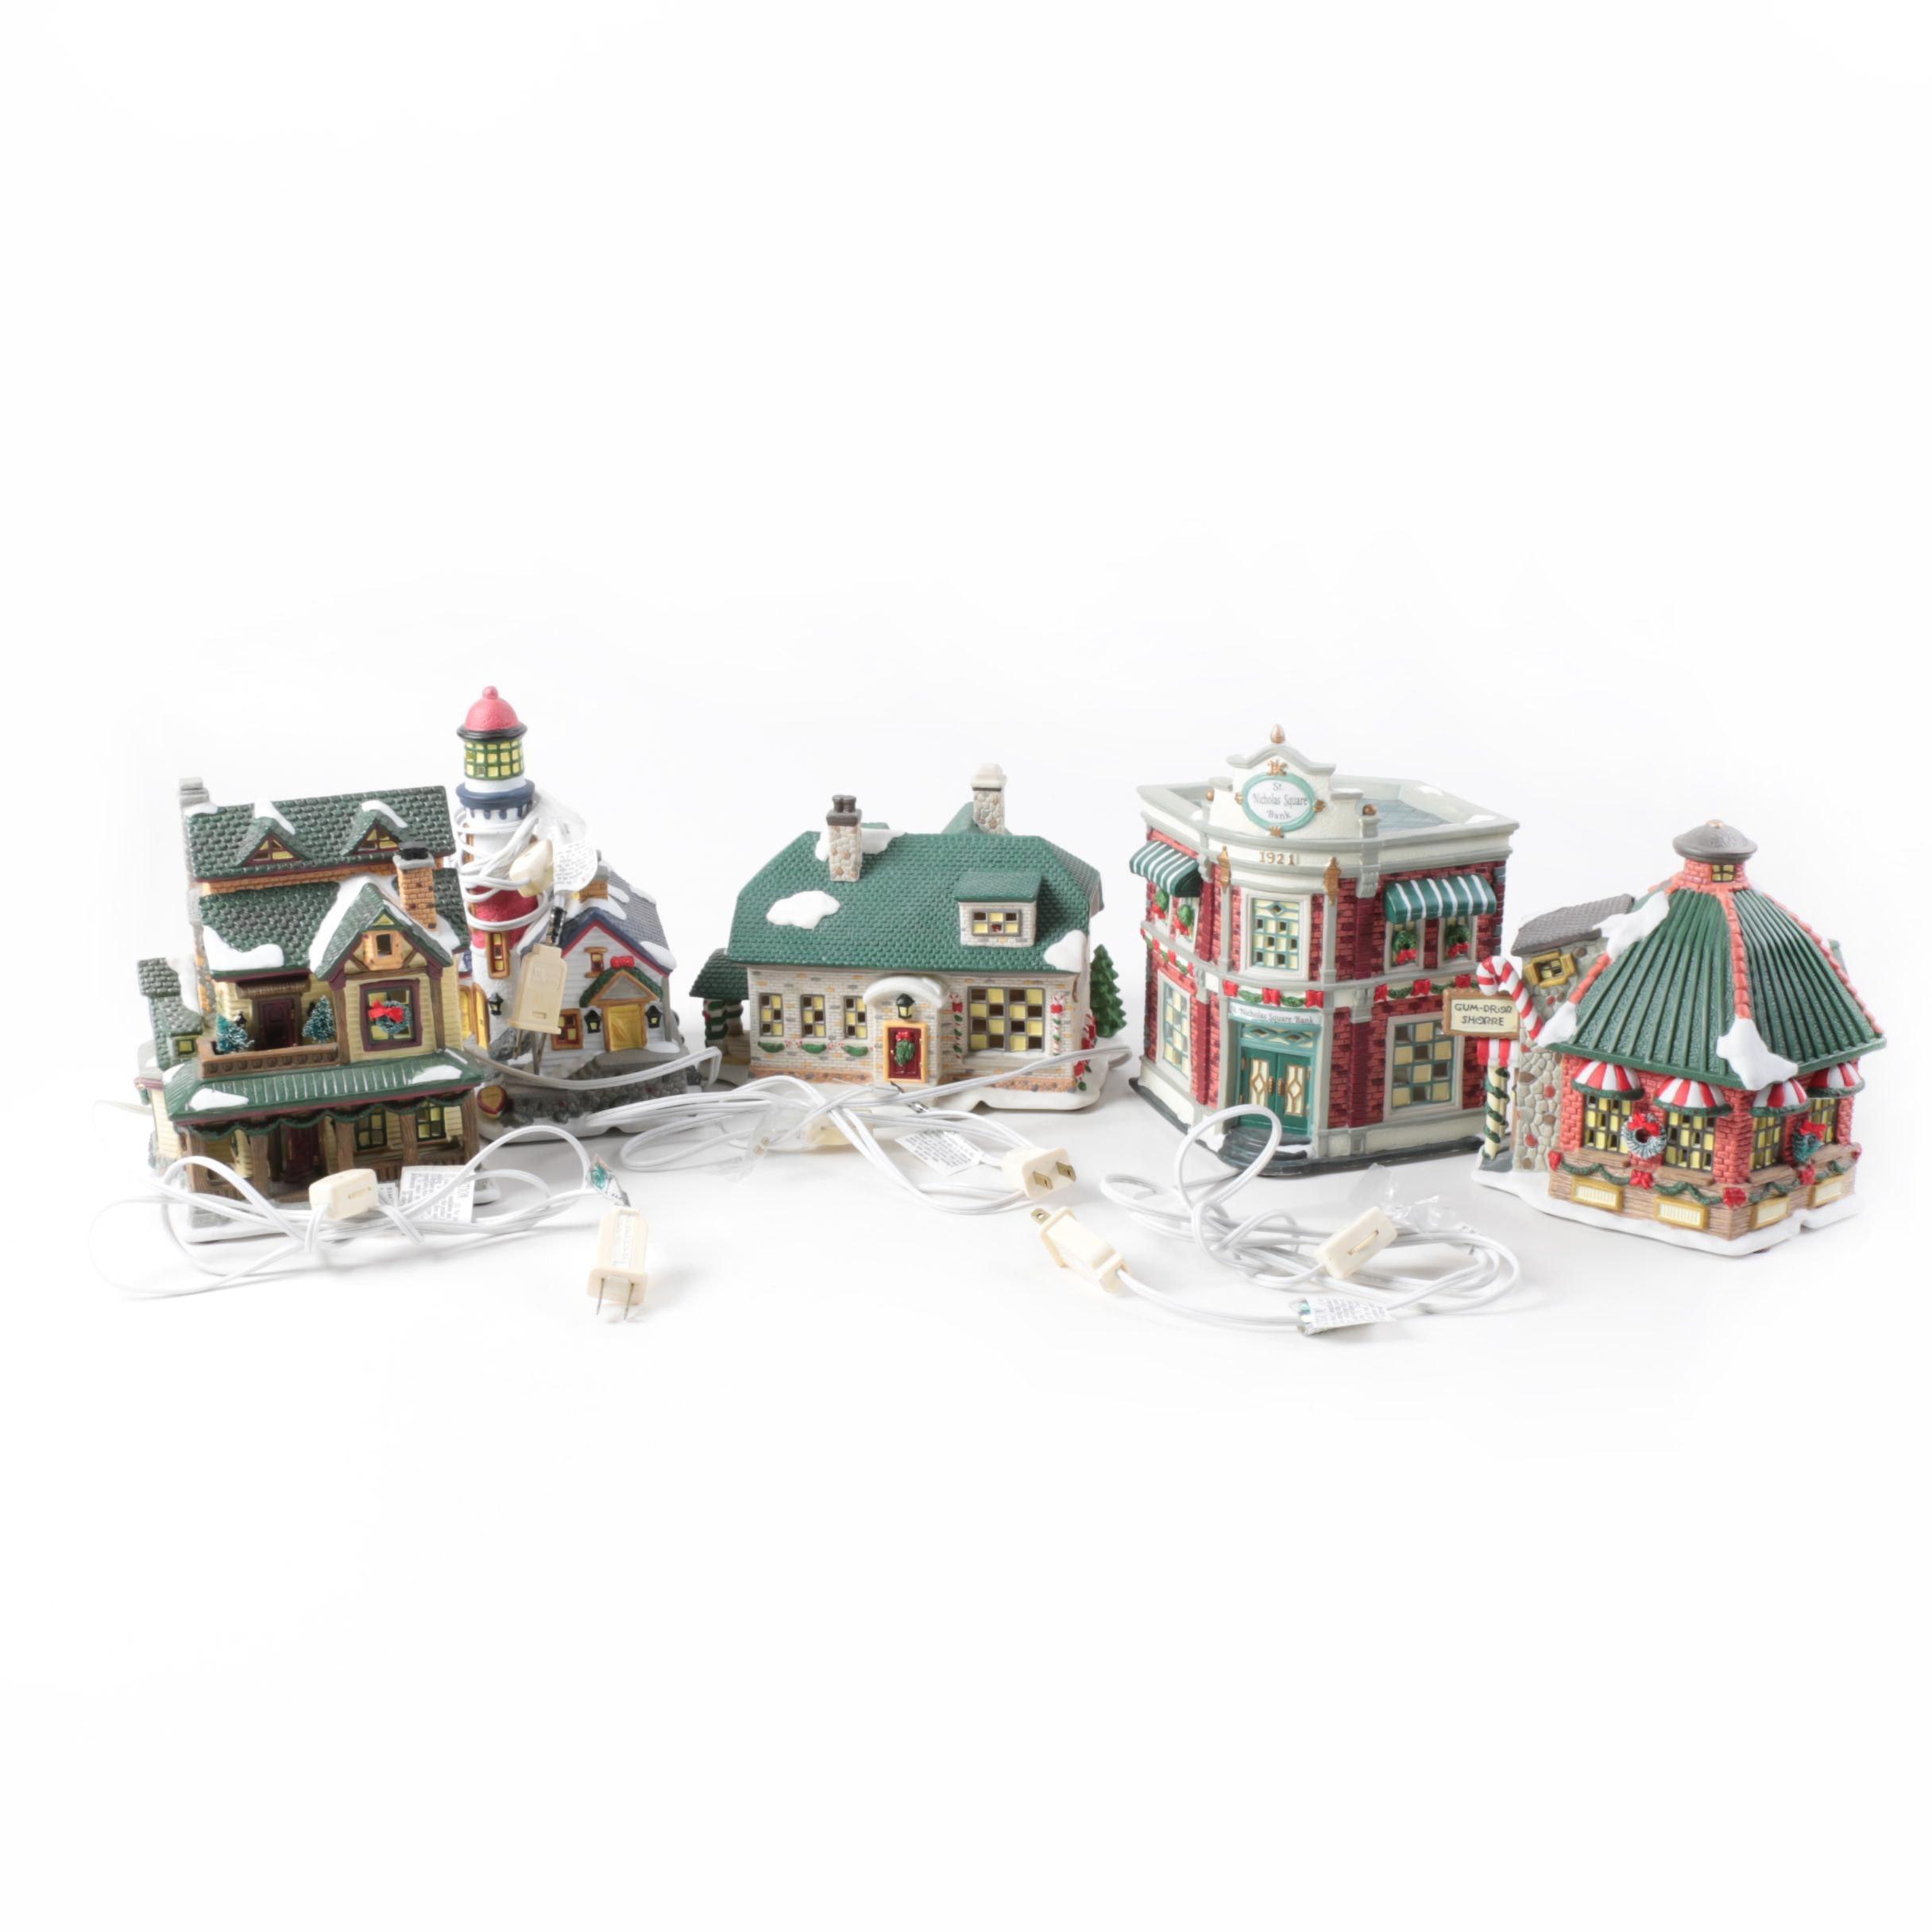 St. Nicholas Square Christmas Village